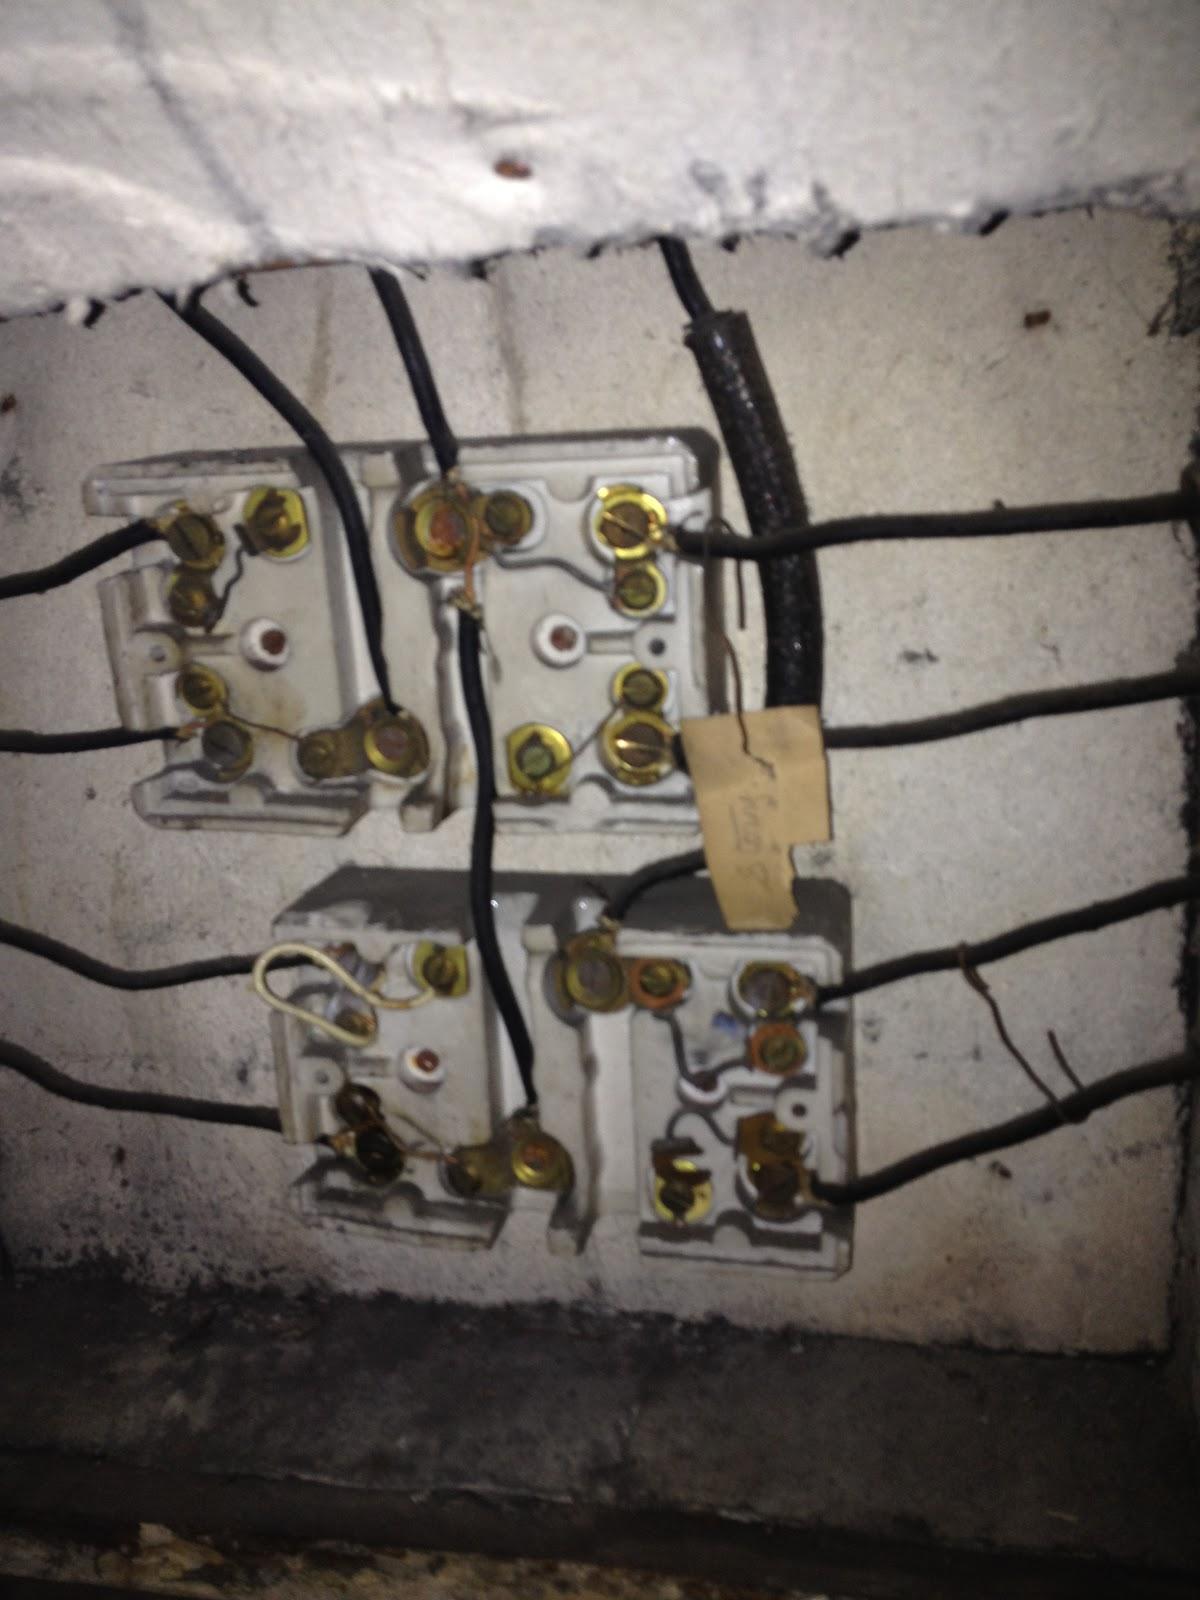 knob and tube breaker box fuses not lossing wiring diagram • knob and tube breaker box fuses knob tube fuse panel knob and tube wiring code knob and tube wiring code